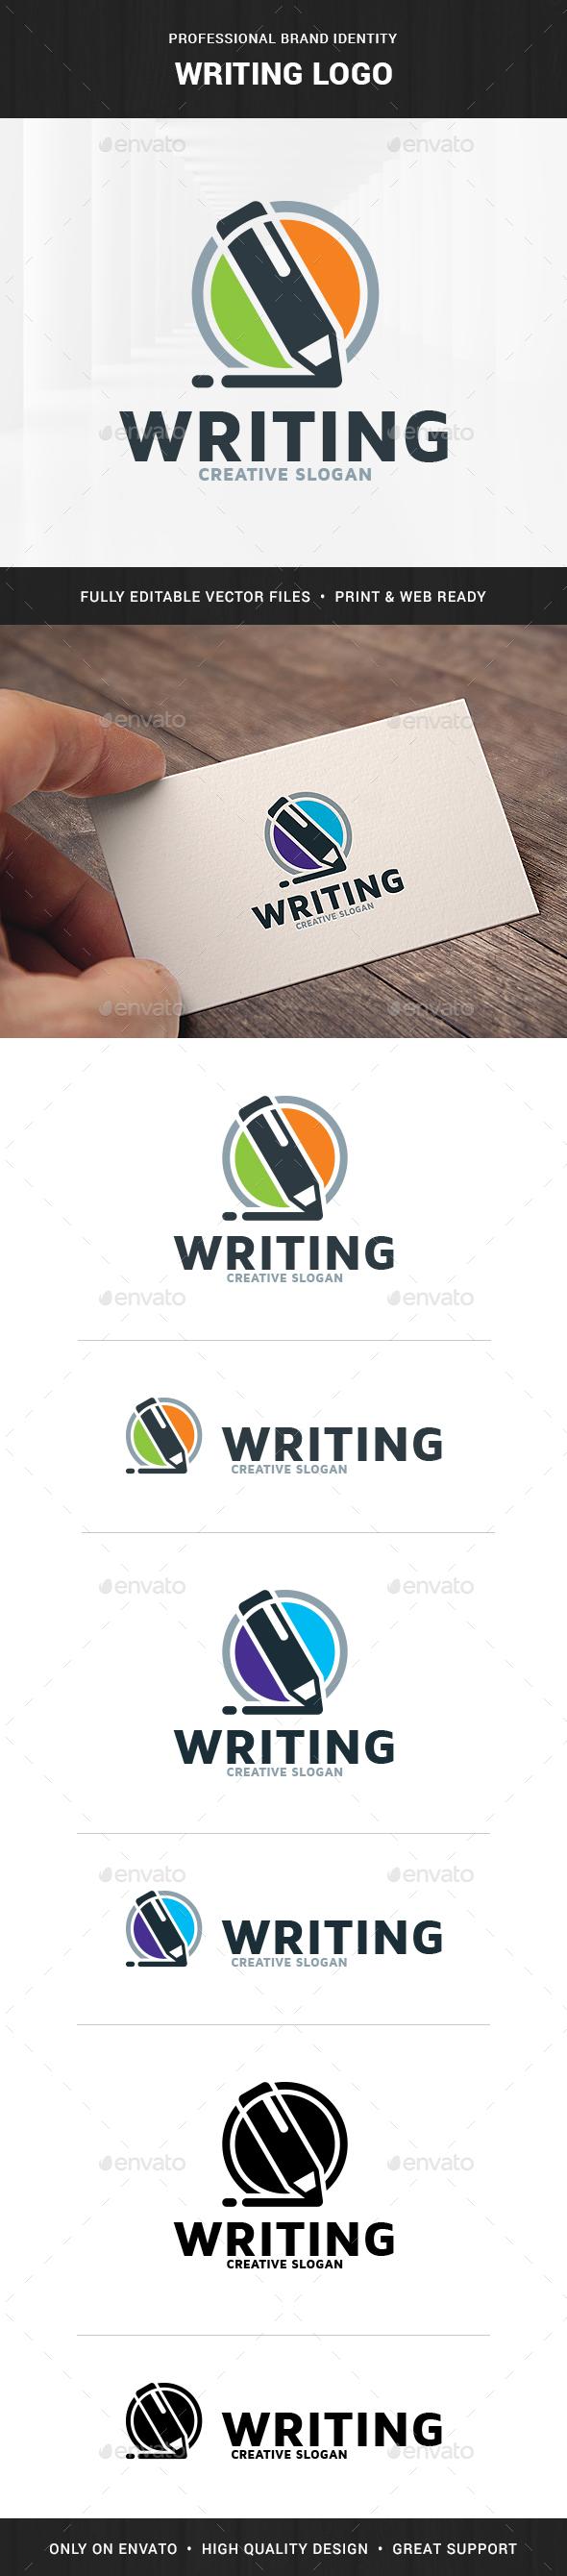 Writing Logo Template